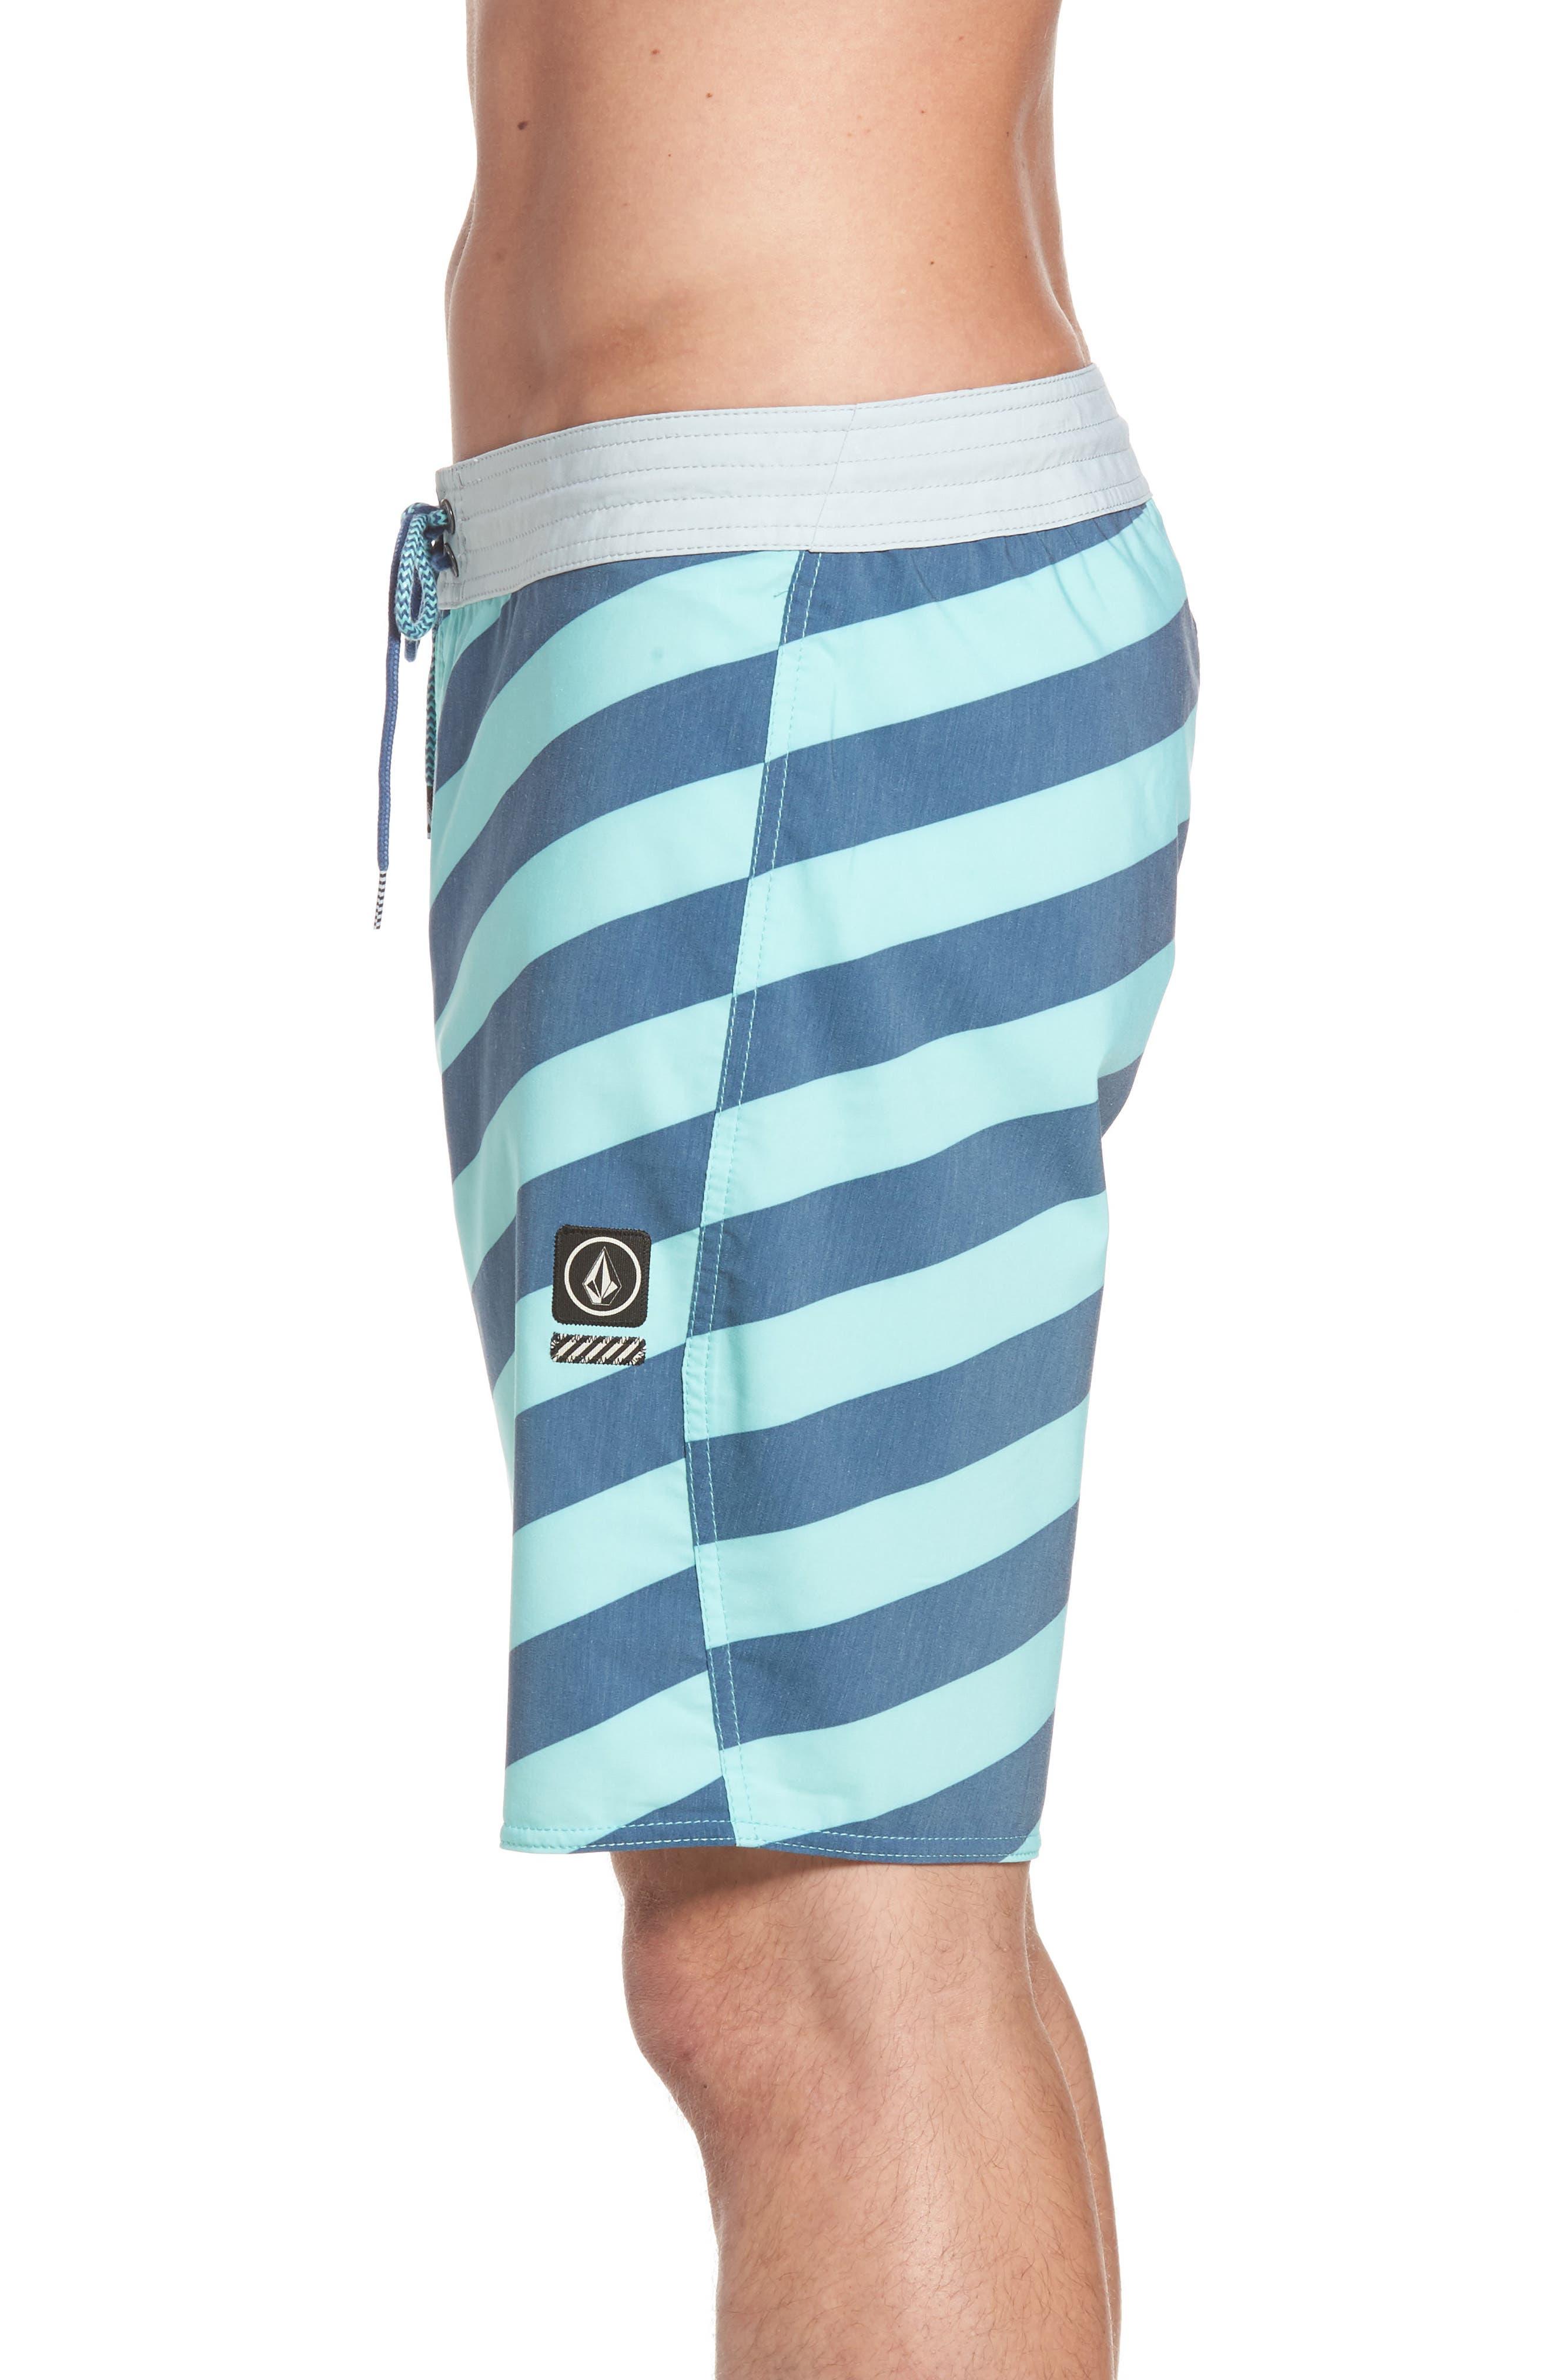 Stripey Slinger Board Shorts,                             Alternate thumbnail 20, color,